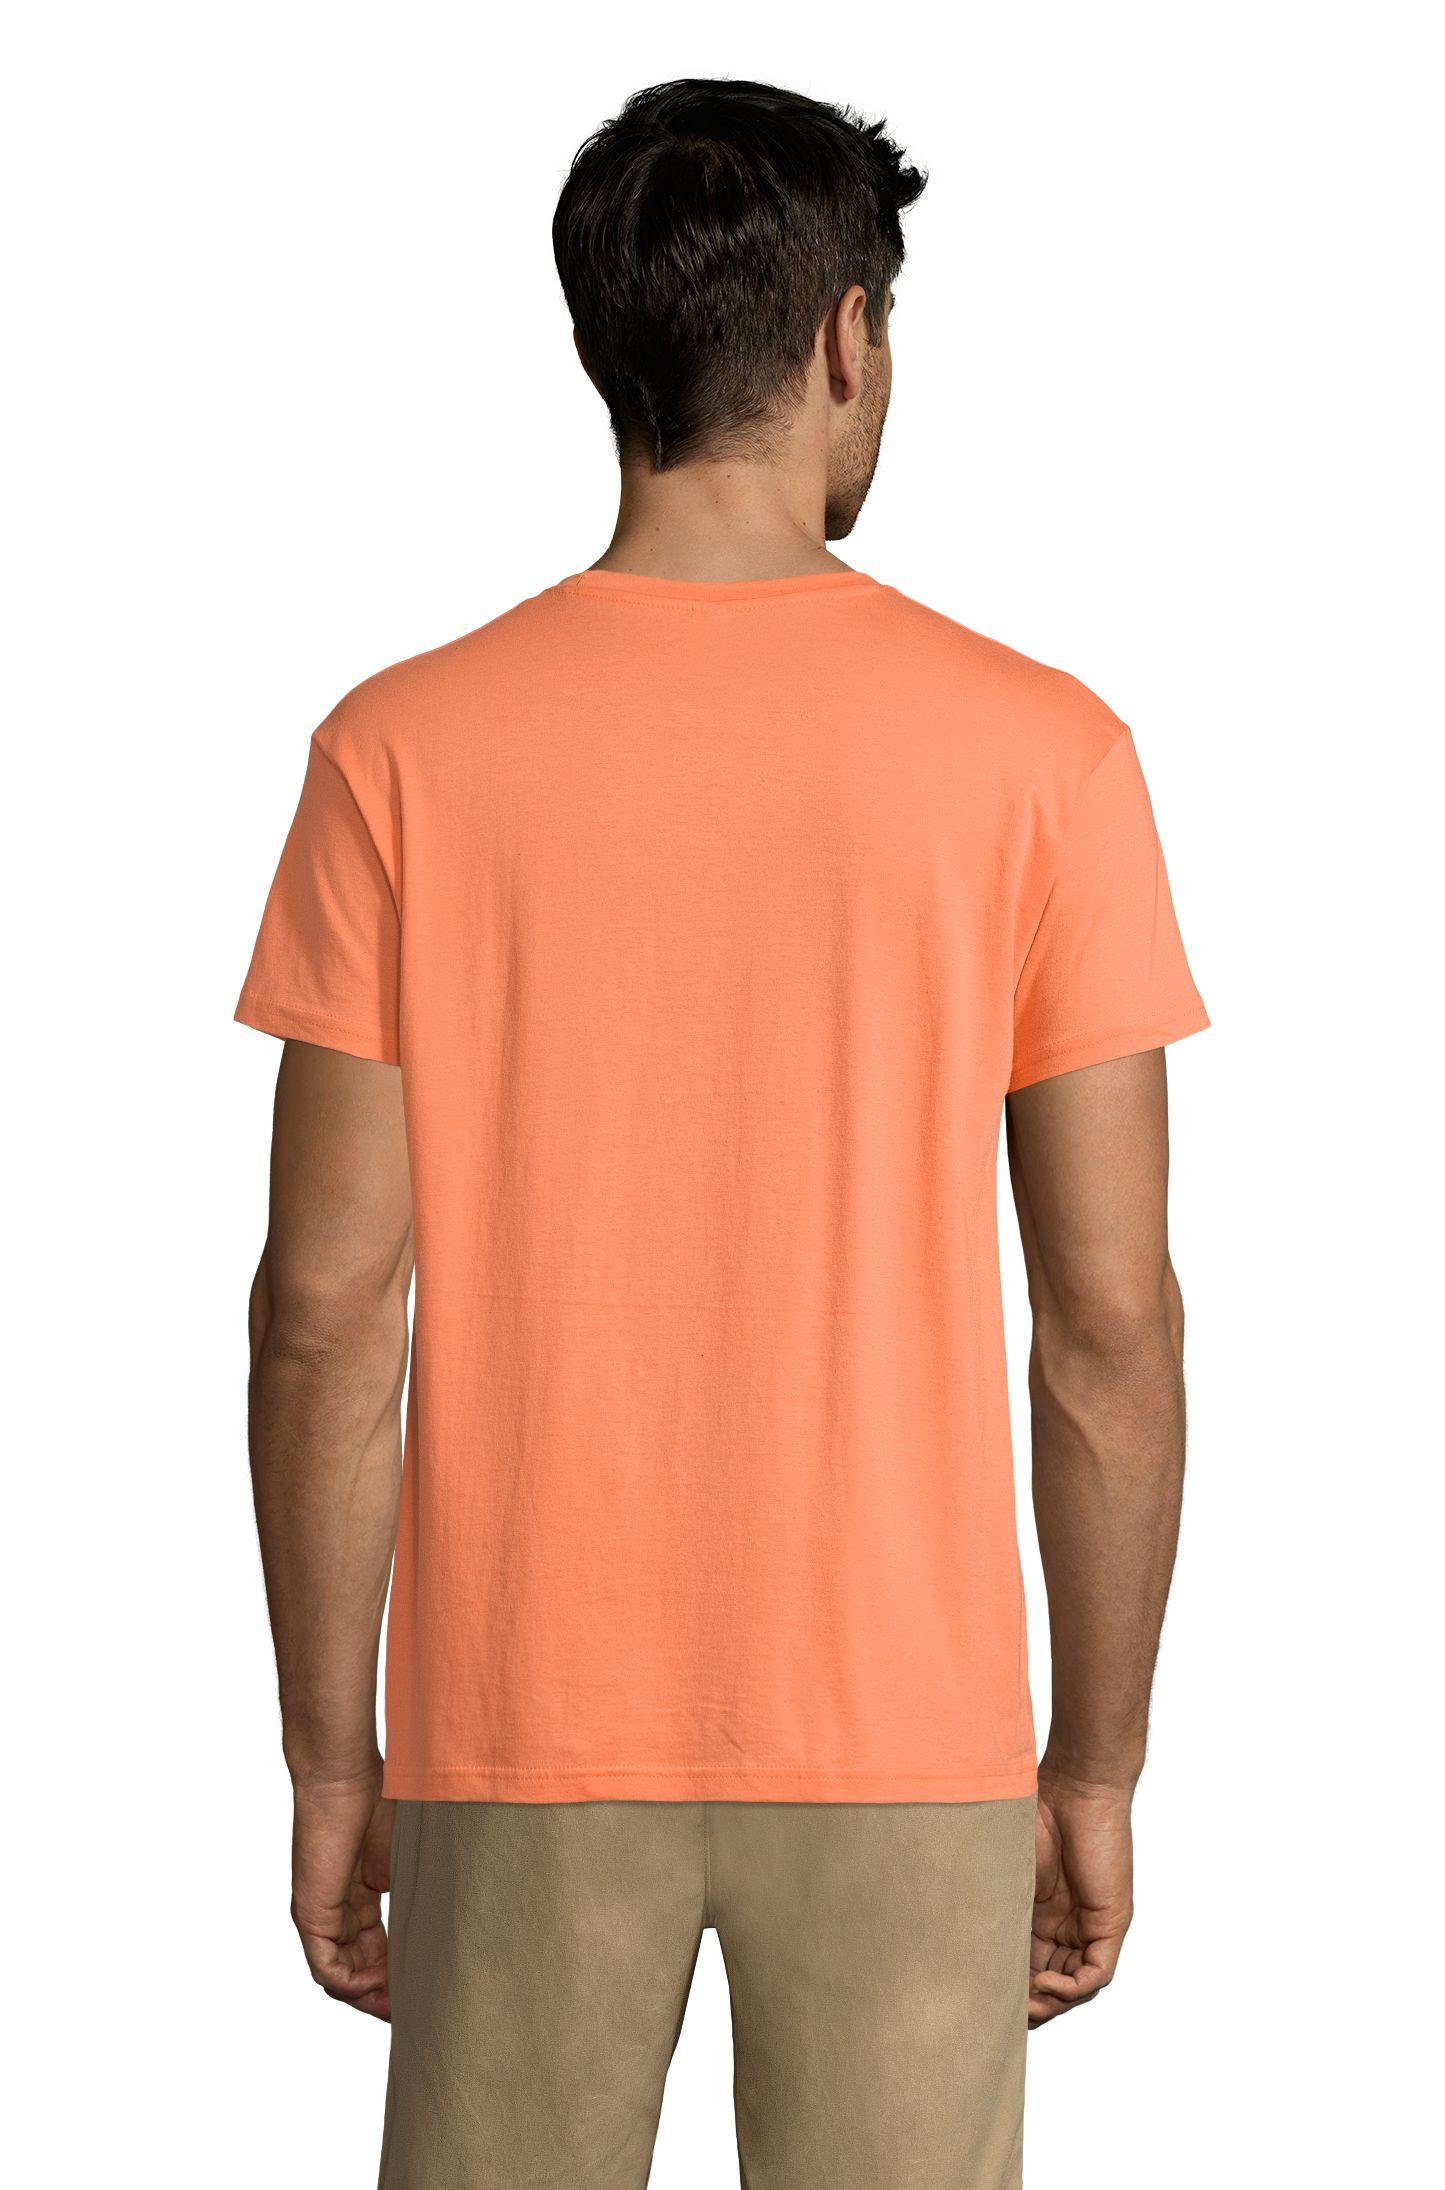 401 - Apricot